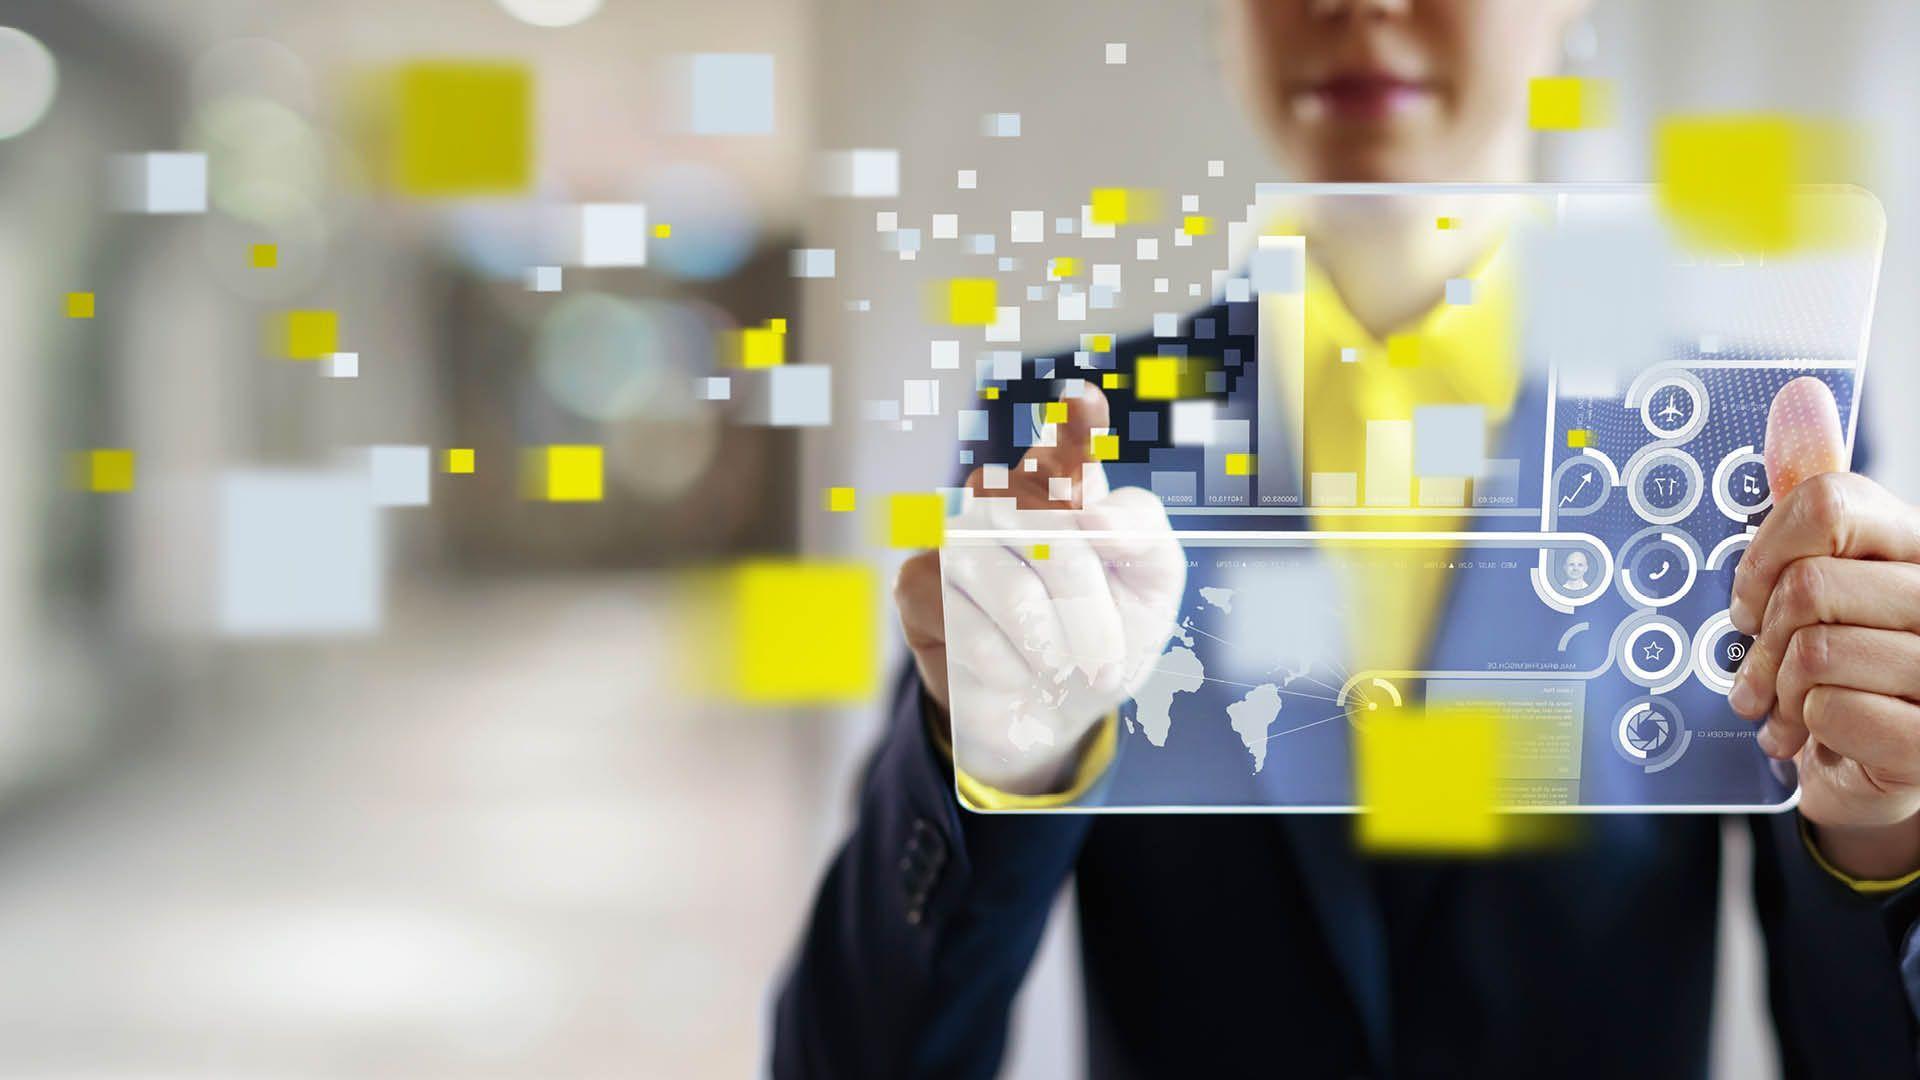 Digital Marketing Wallpapers - Top Free Digital Marketing ...